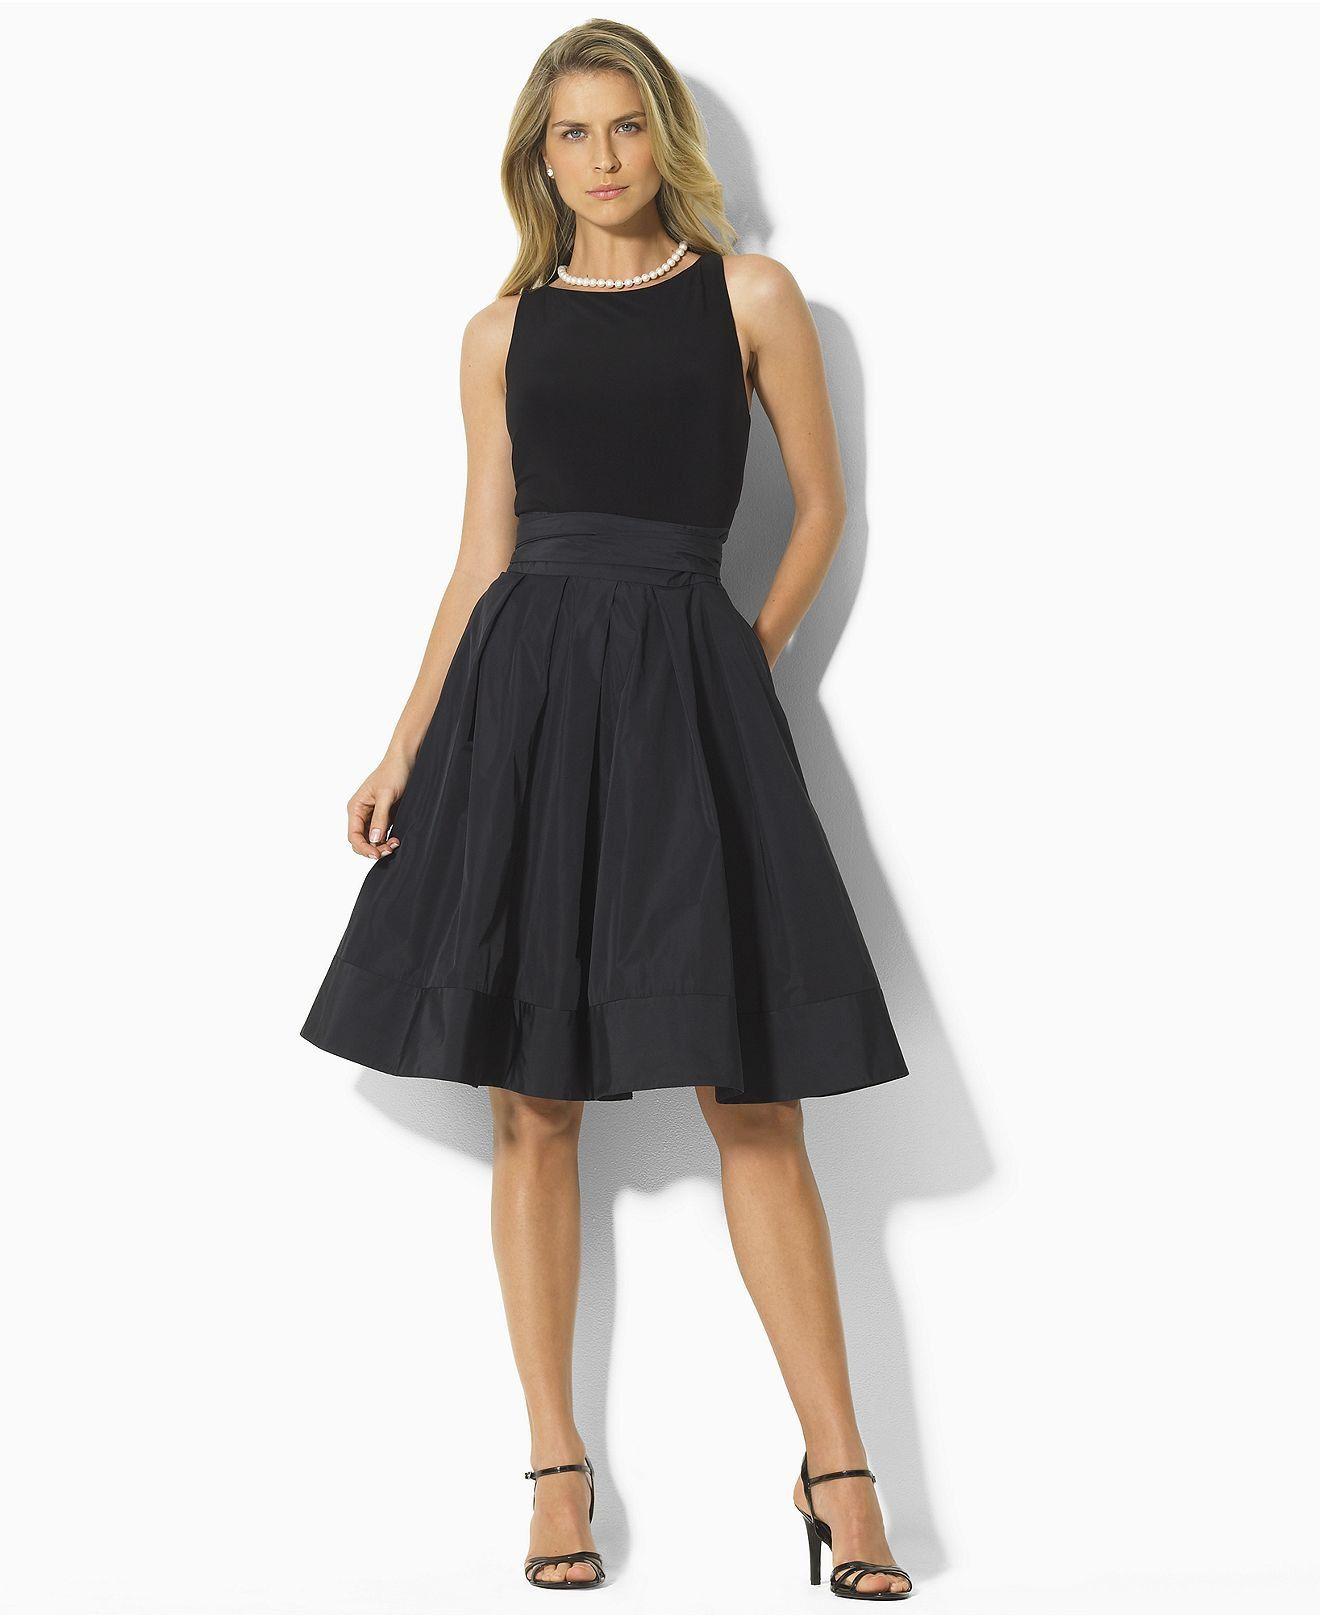 dresses at macy\'s for women | ... Ralph Lauren Dress, Pleated ...